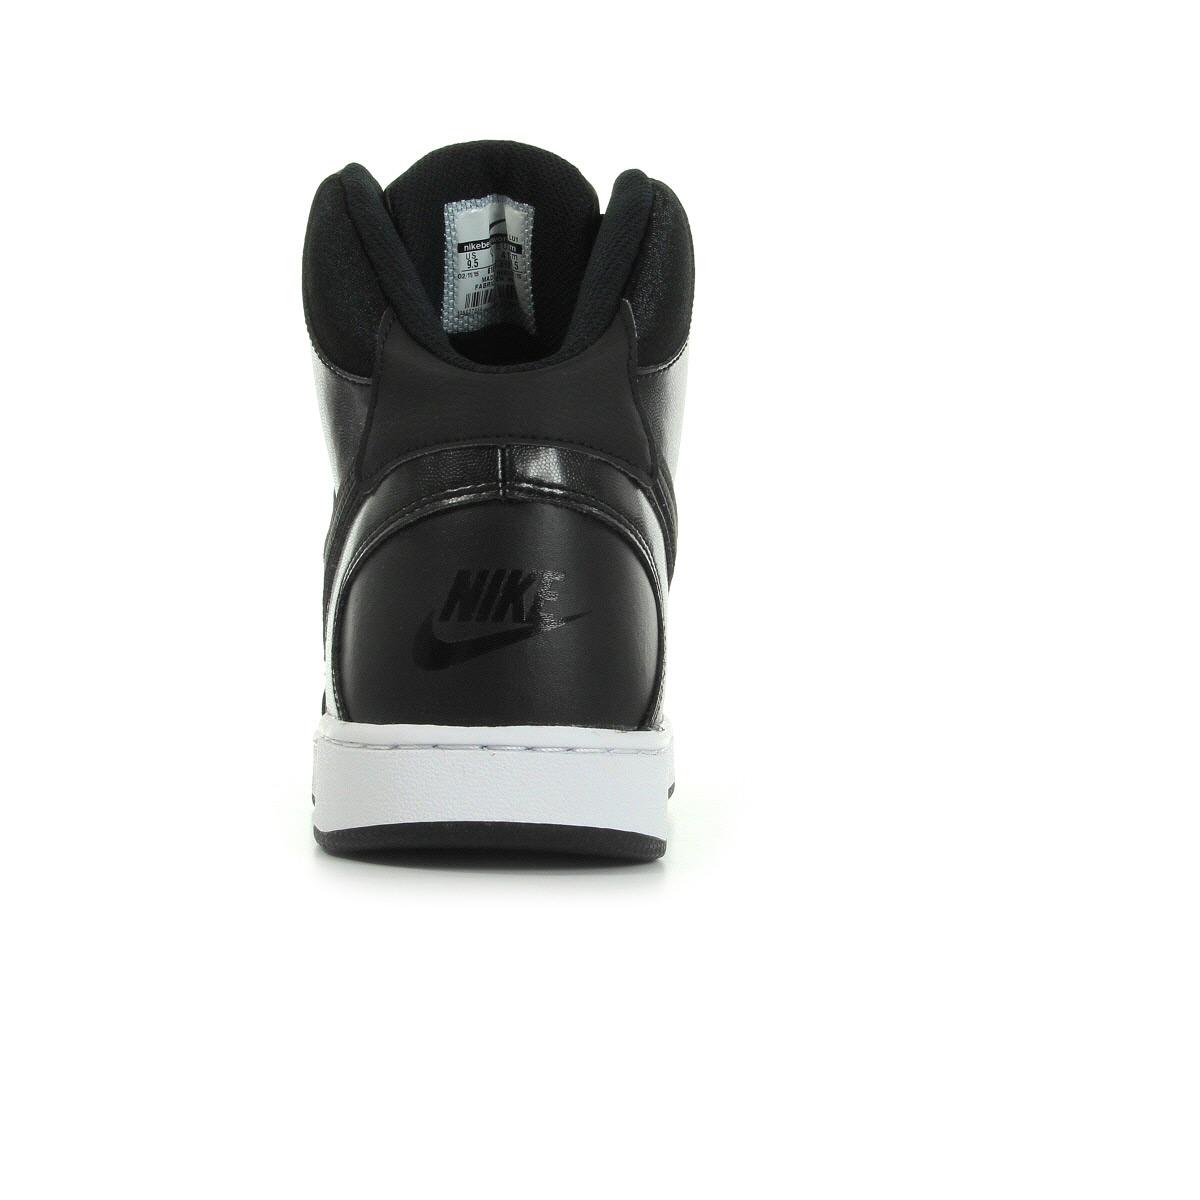 nike air max pas cher femme un - Chaussures Baskets Nike femme Wmns Son Of Force Mid taille Noir ...